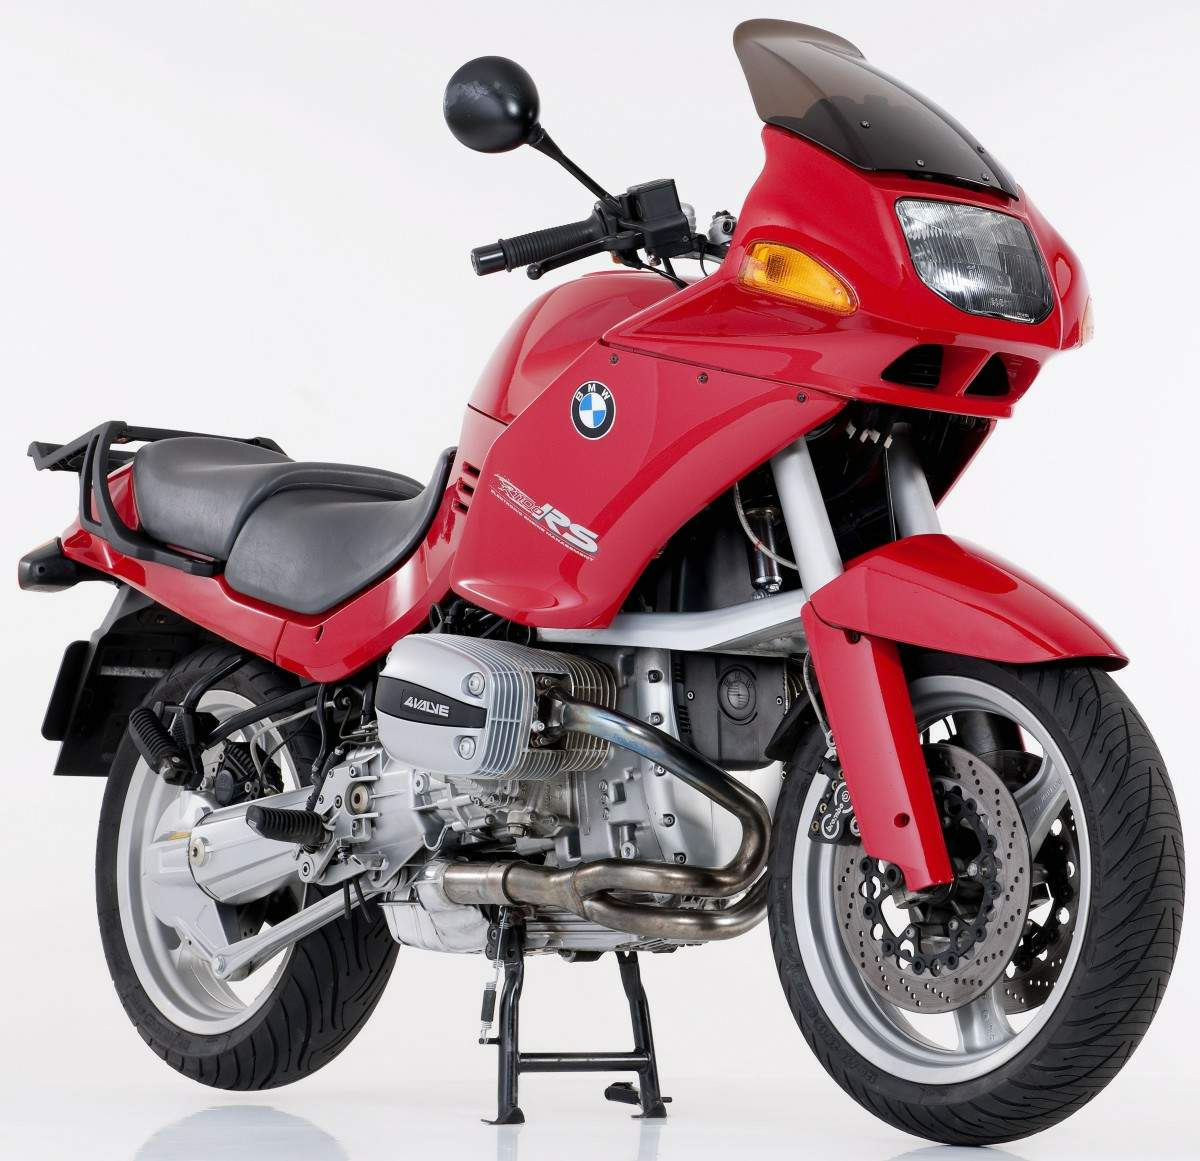 Bmwr: BMW R 1100 RS Specs